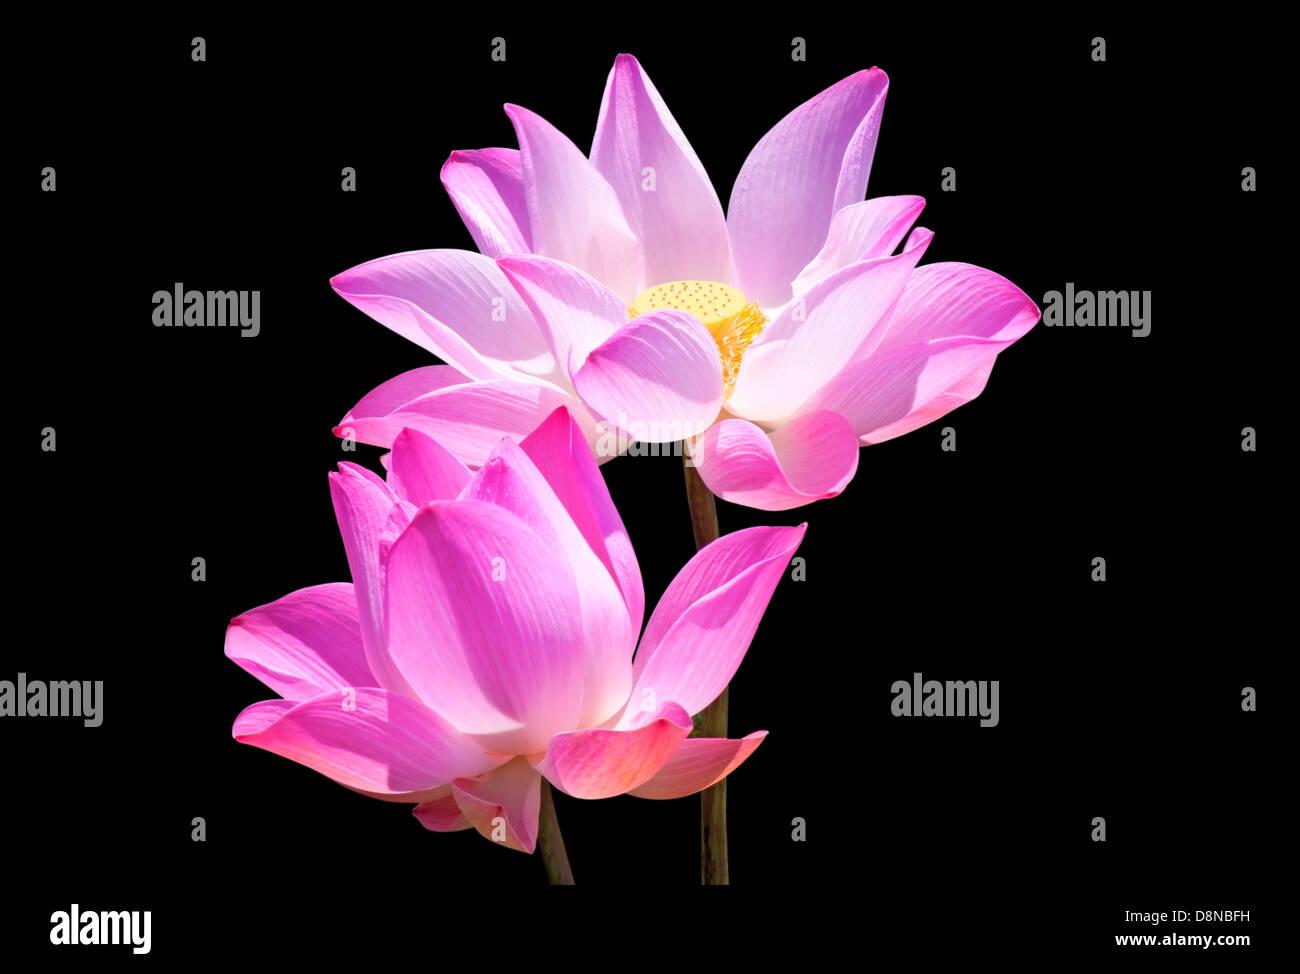 Beautiful Lotus Lotus Flower Isolated On Black Background Stock